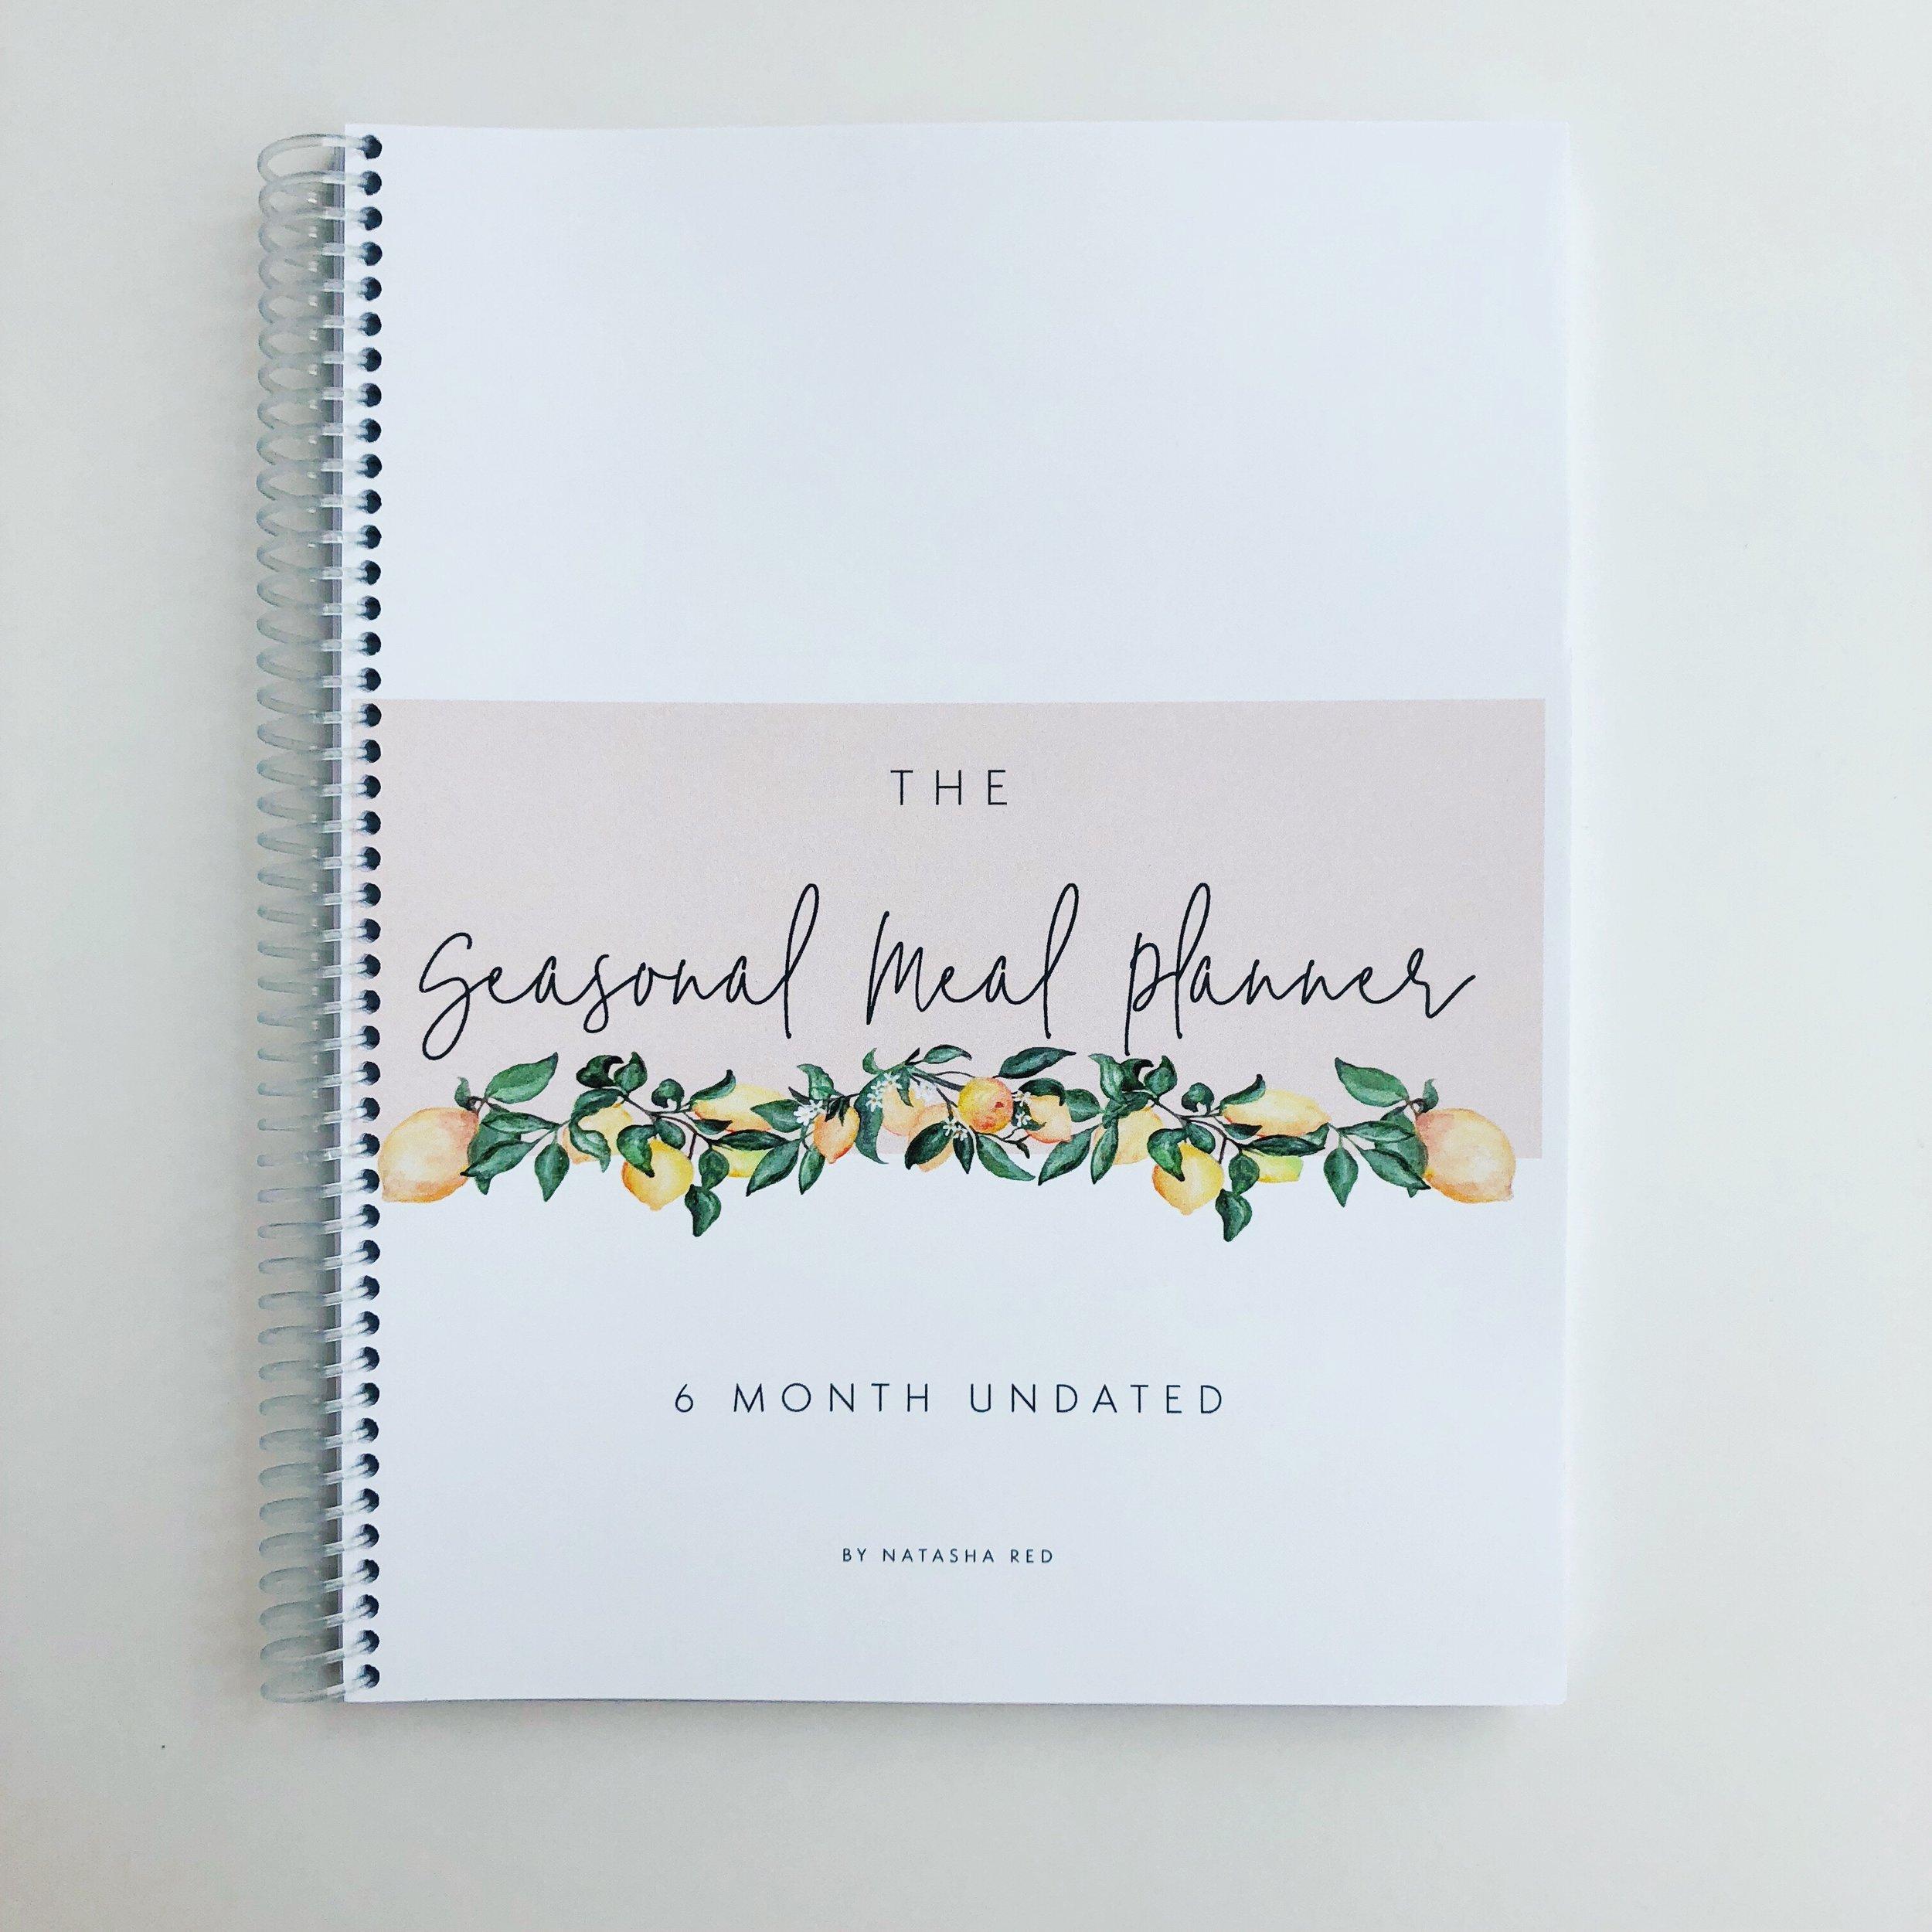 Seasonal Meal Planner | 6 Month Undated